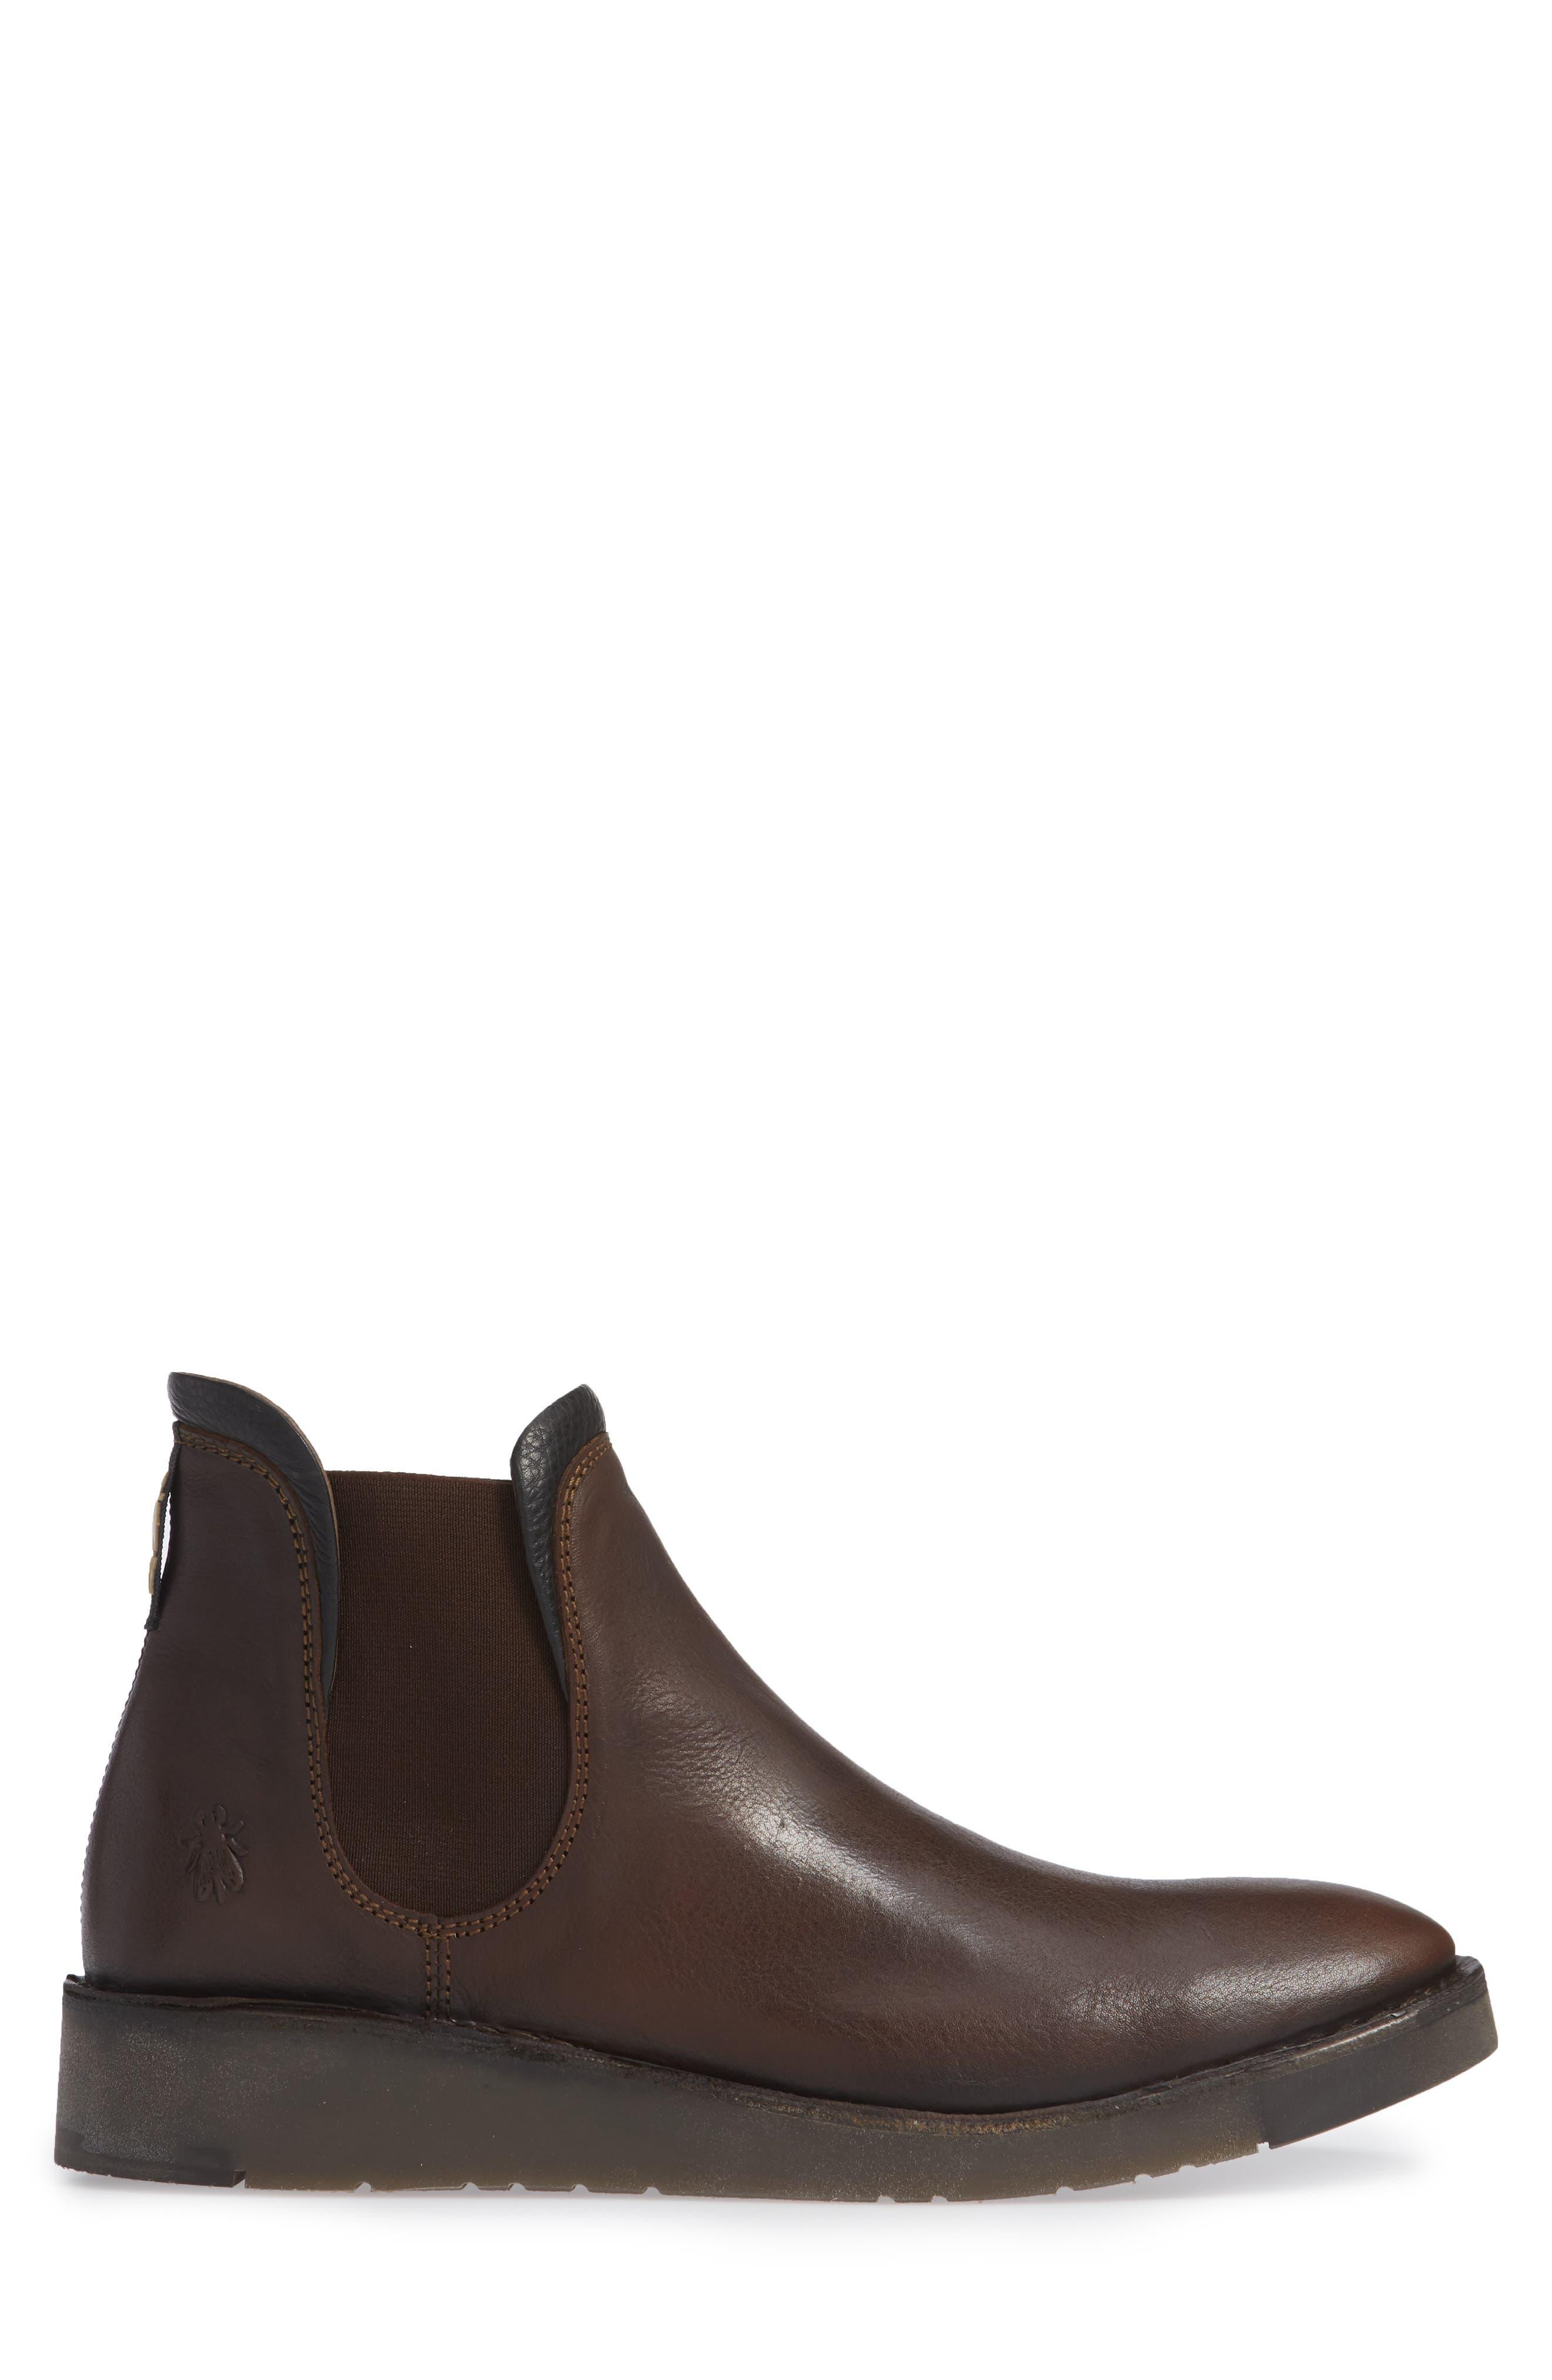 Sern Water Resistant Chelsea Boot,                             Alternate thumbnail 6, color,                             Brown Apso